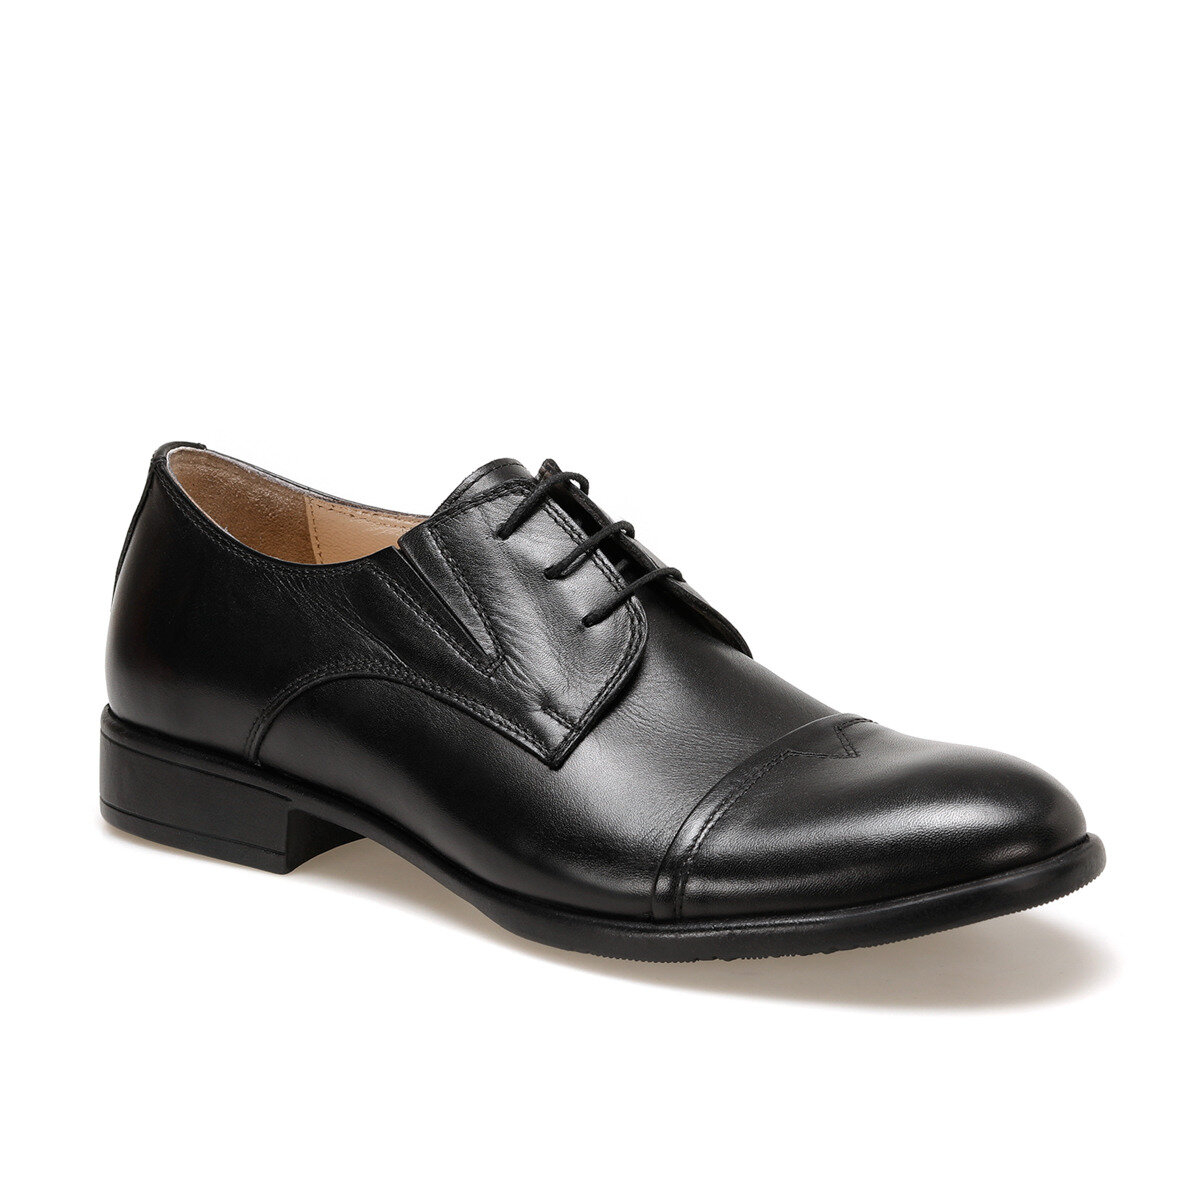 FLO 308 Black Male Maskaret Shoes Garamond